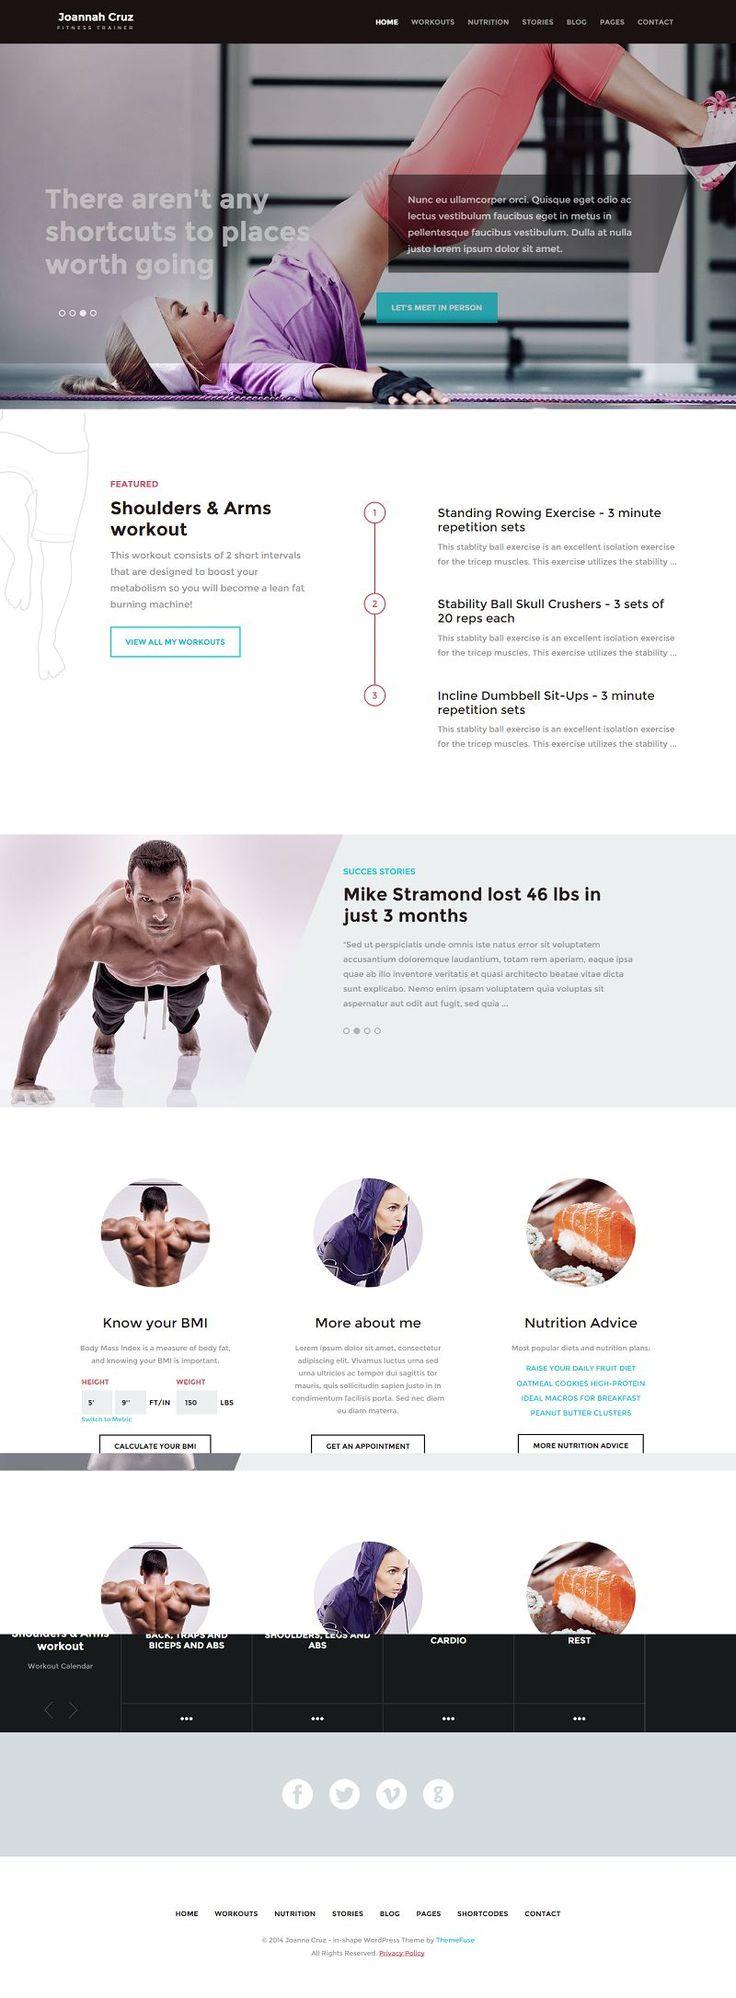 In Shape Responsive #WordPress Theme for Fitness Sites http://www.themesandmods.com/premium-wordpress-themes/shape/